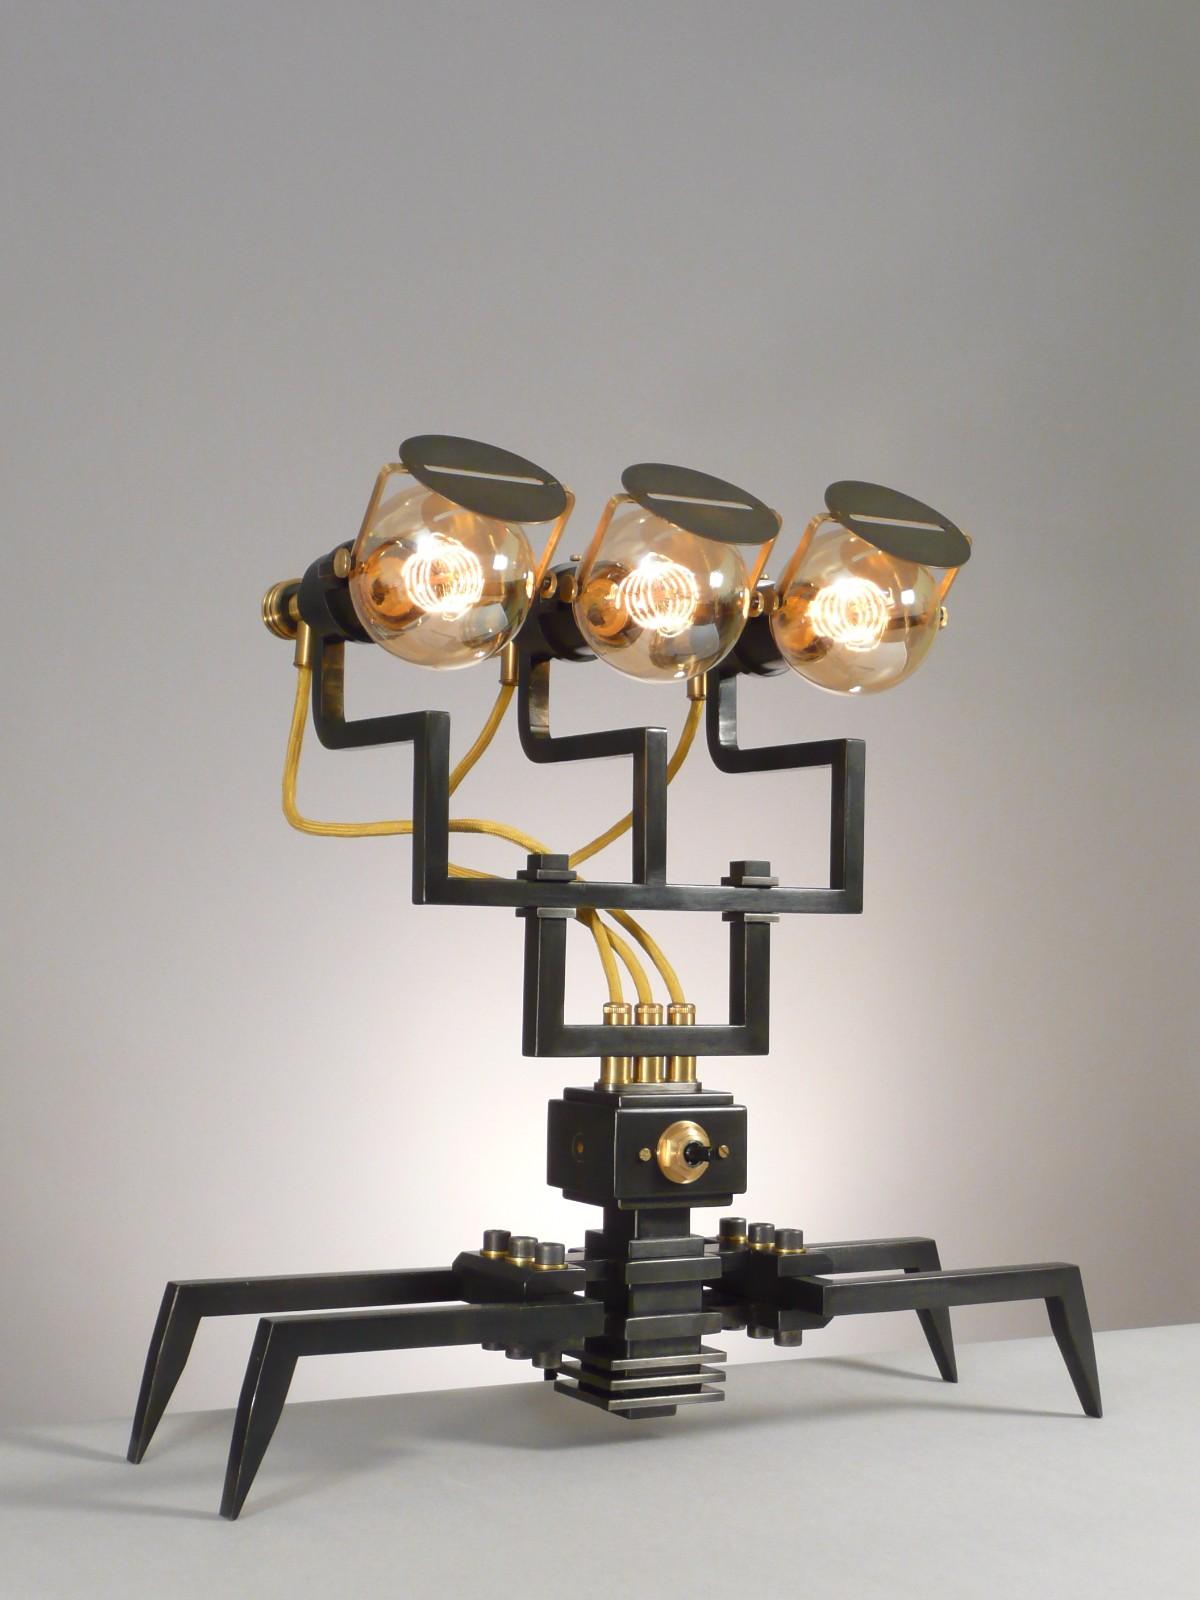 4MAD Gallery Machine Lights by Frank Buchwald 5.jpg